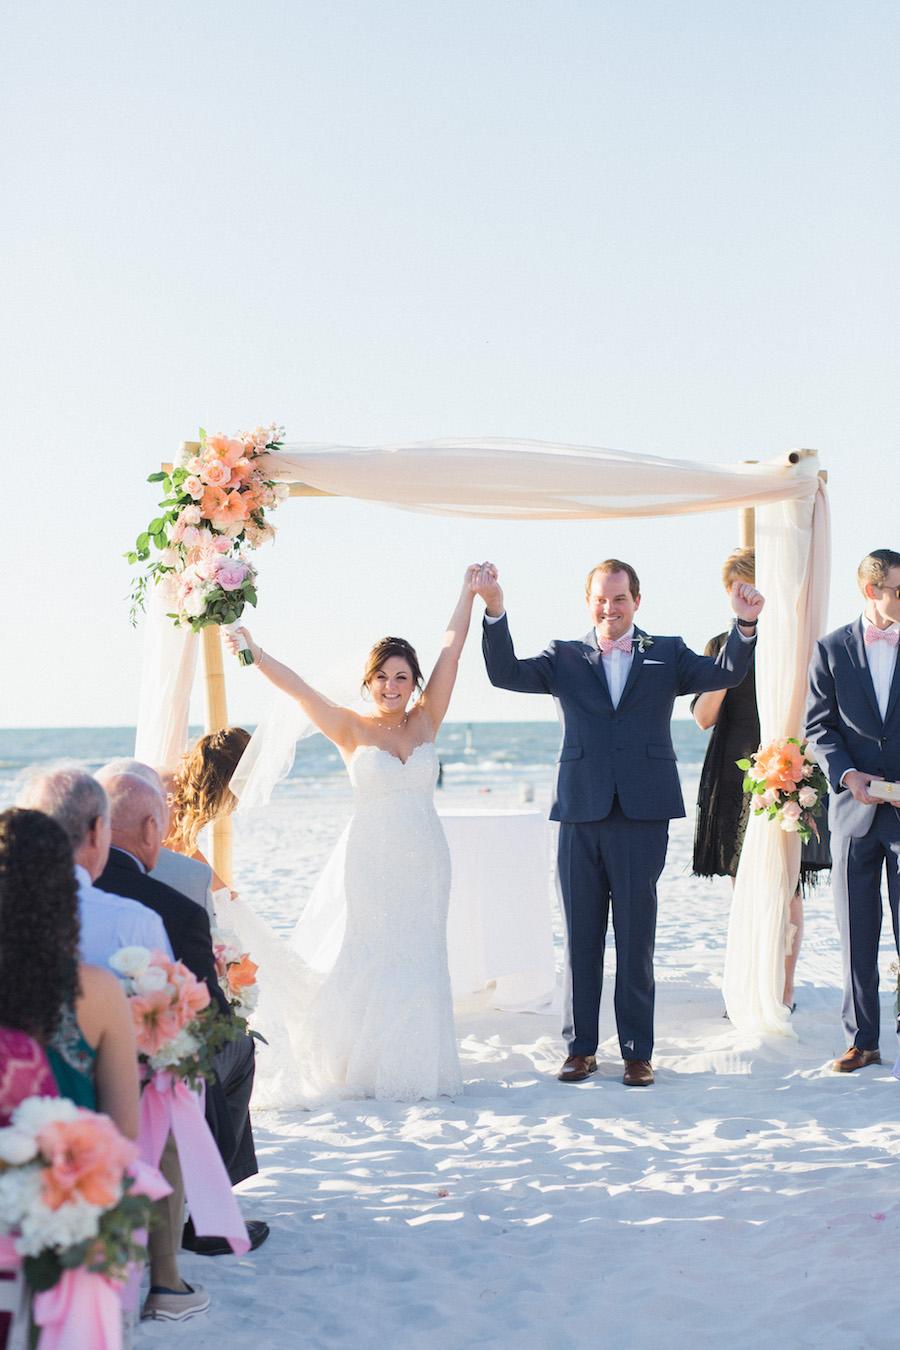 Bride and Groom Ceremony Celebration | Ivory and blush Beach chic wedding Ceremony Decor | Tampa Bay Beachfront Hotel Wedding Venue Hilton Clearwater Beach